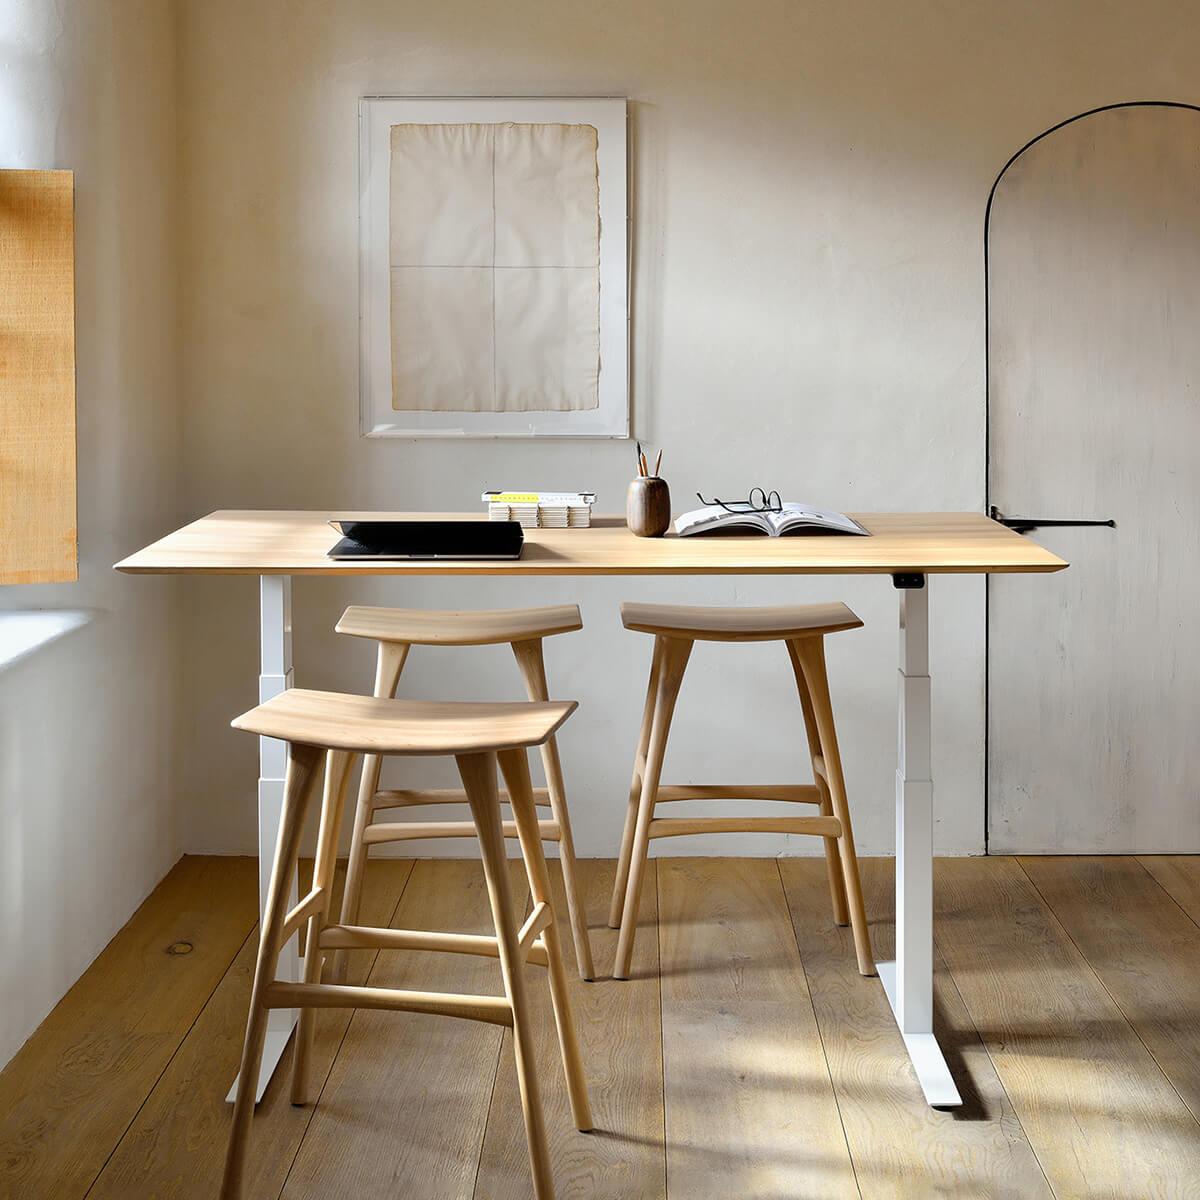 Oak Osso bar stool